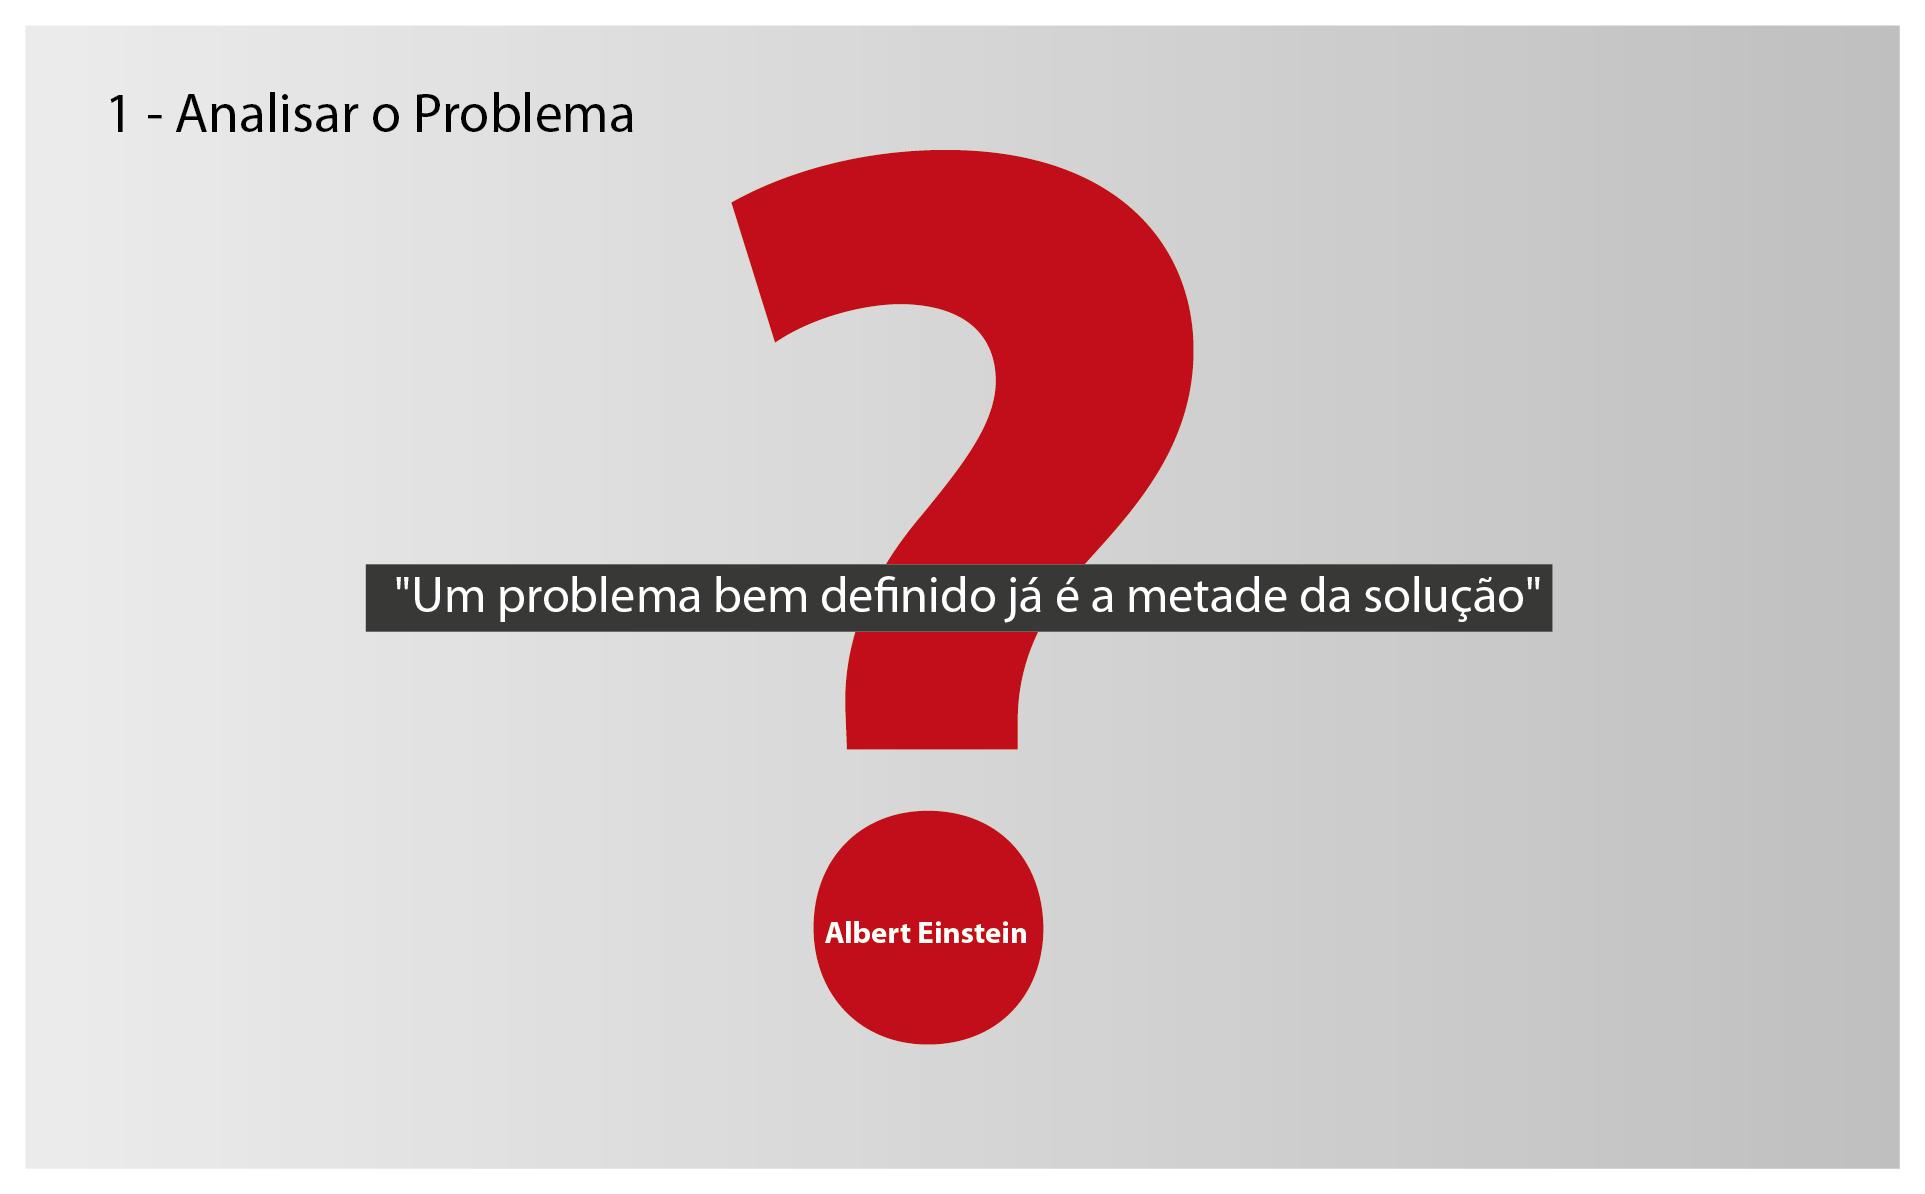 Análise ao Problema